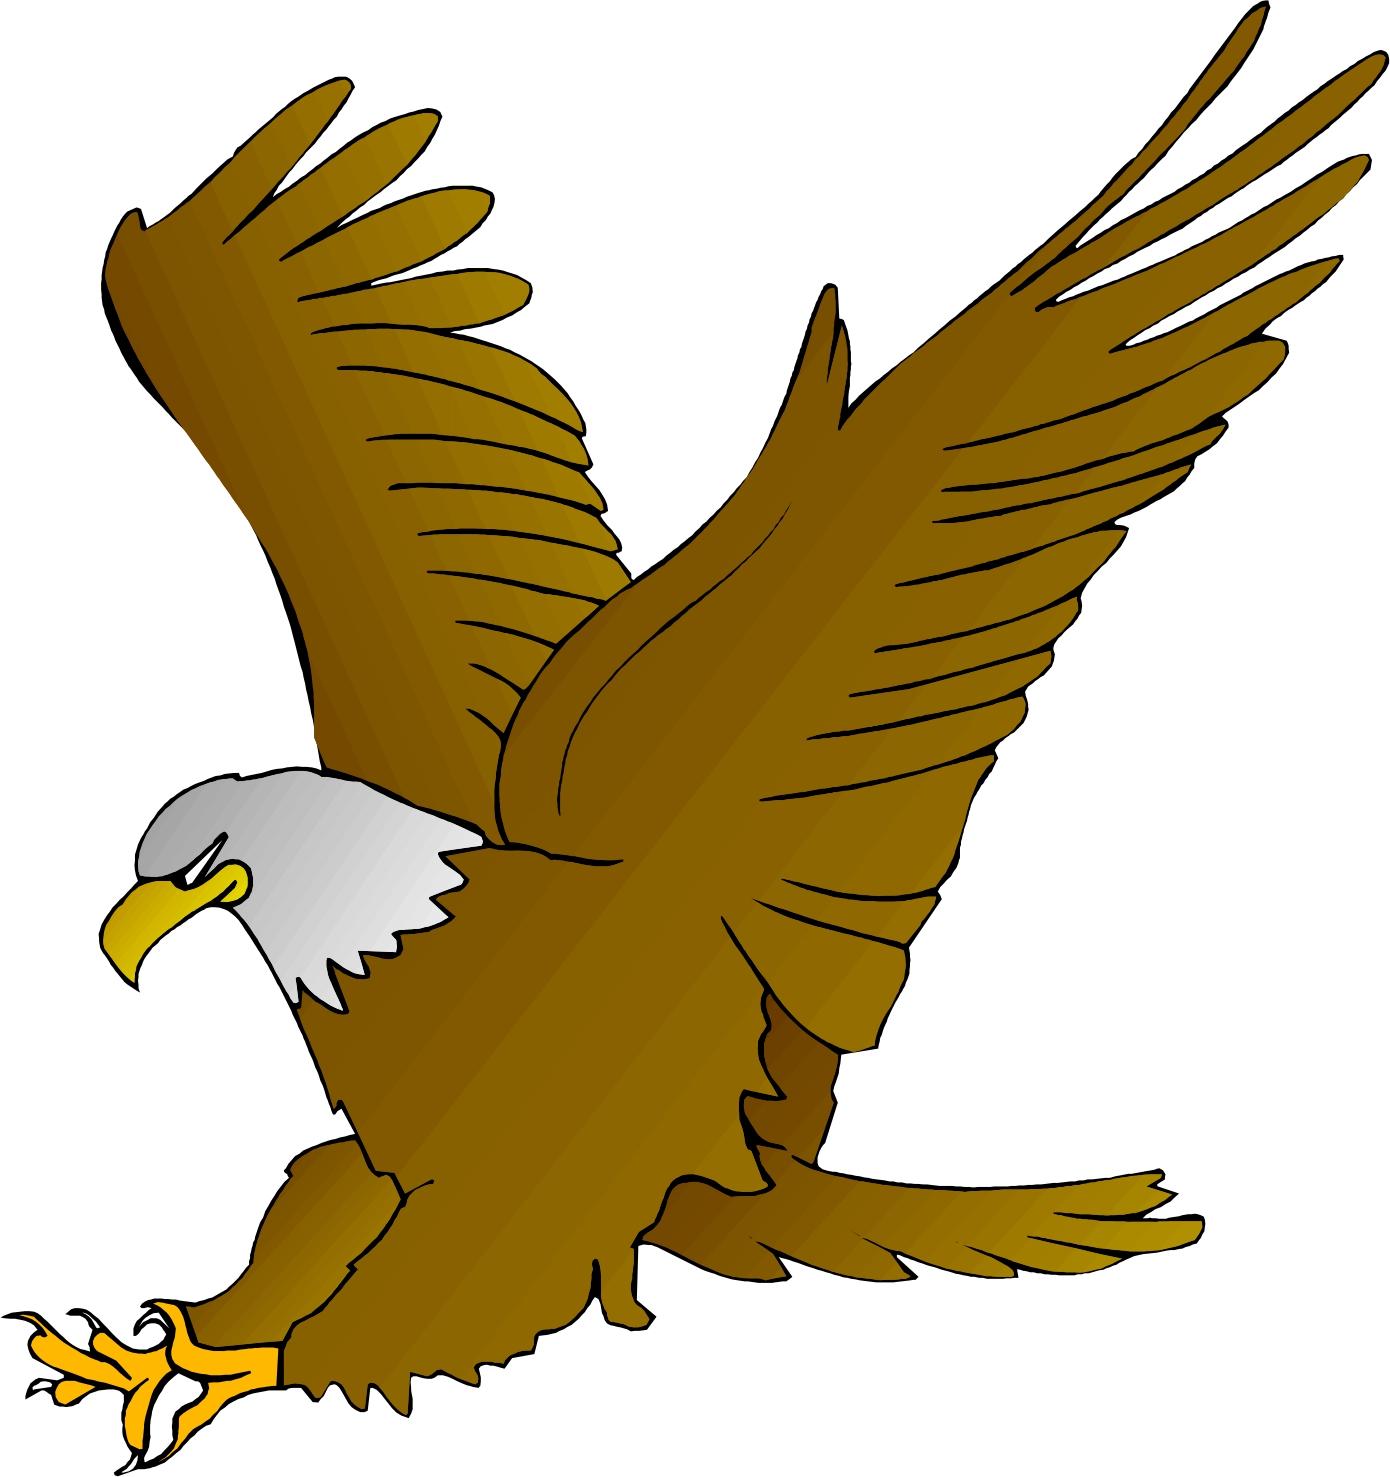 Eagle clipart Cute%20eagle%20clipart Eagle Cute Clipart Clipart